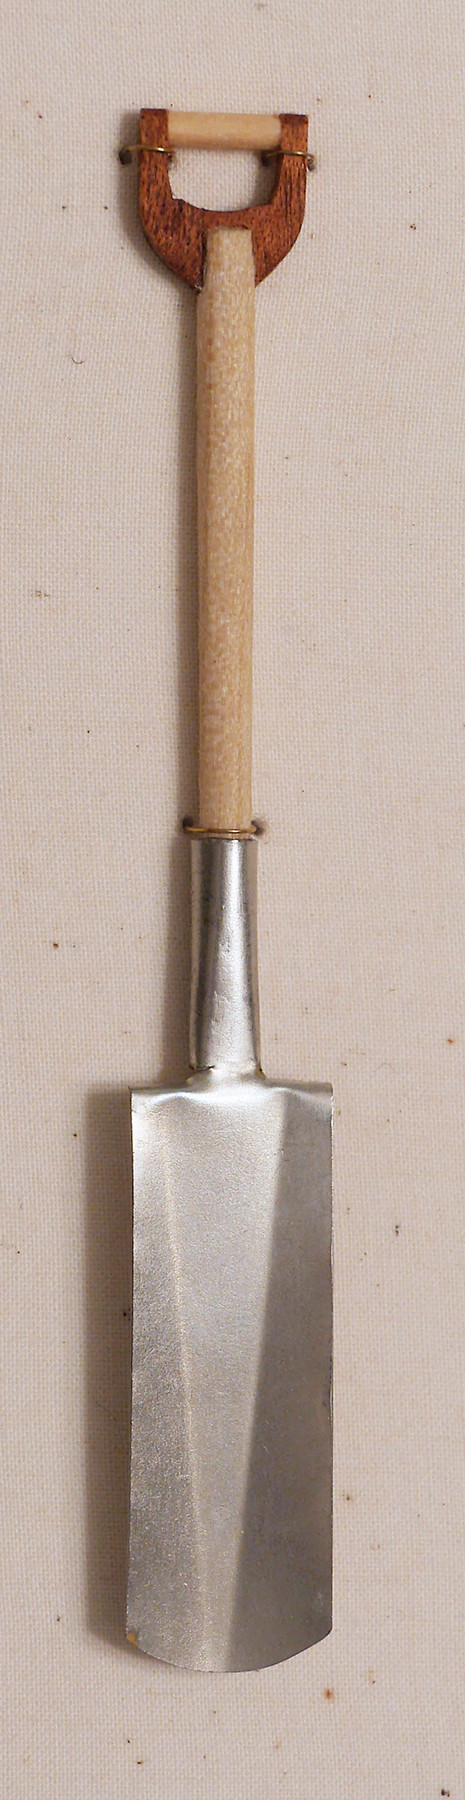 a_shovel.jpg